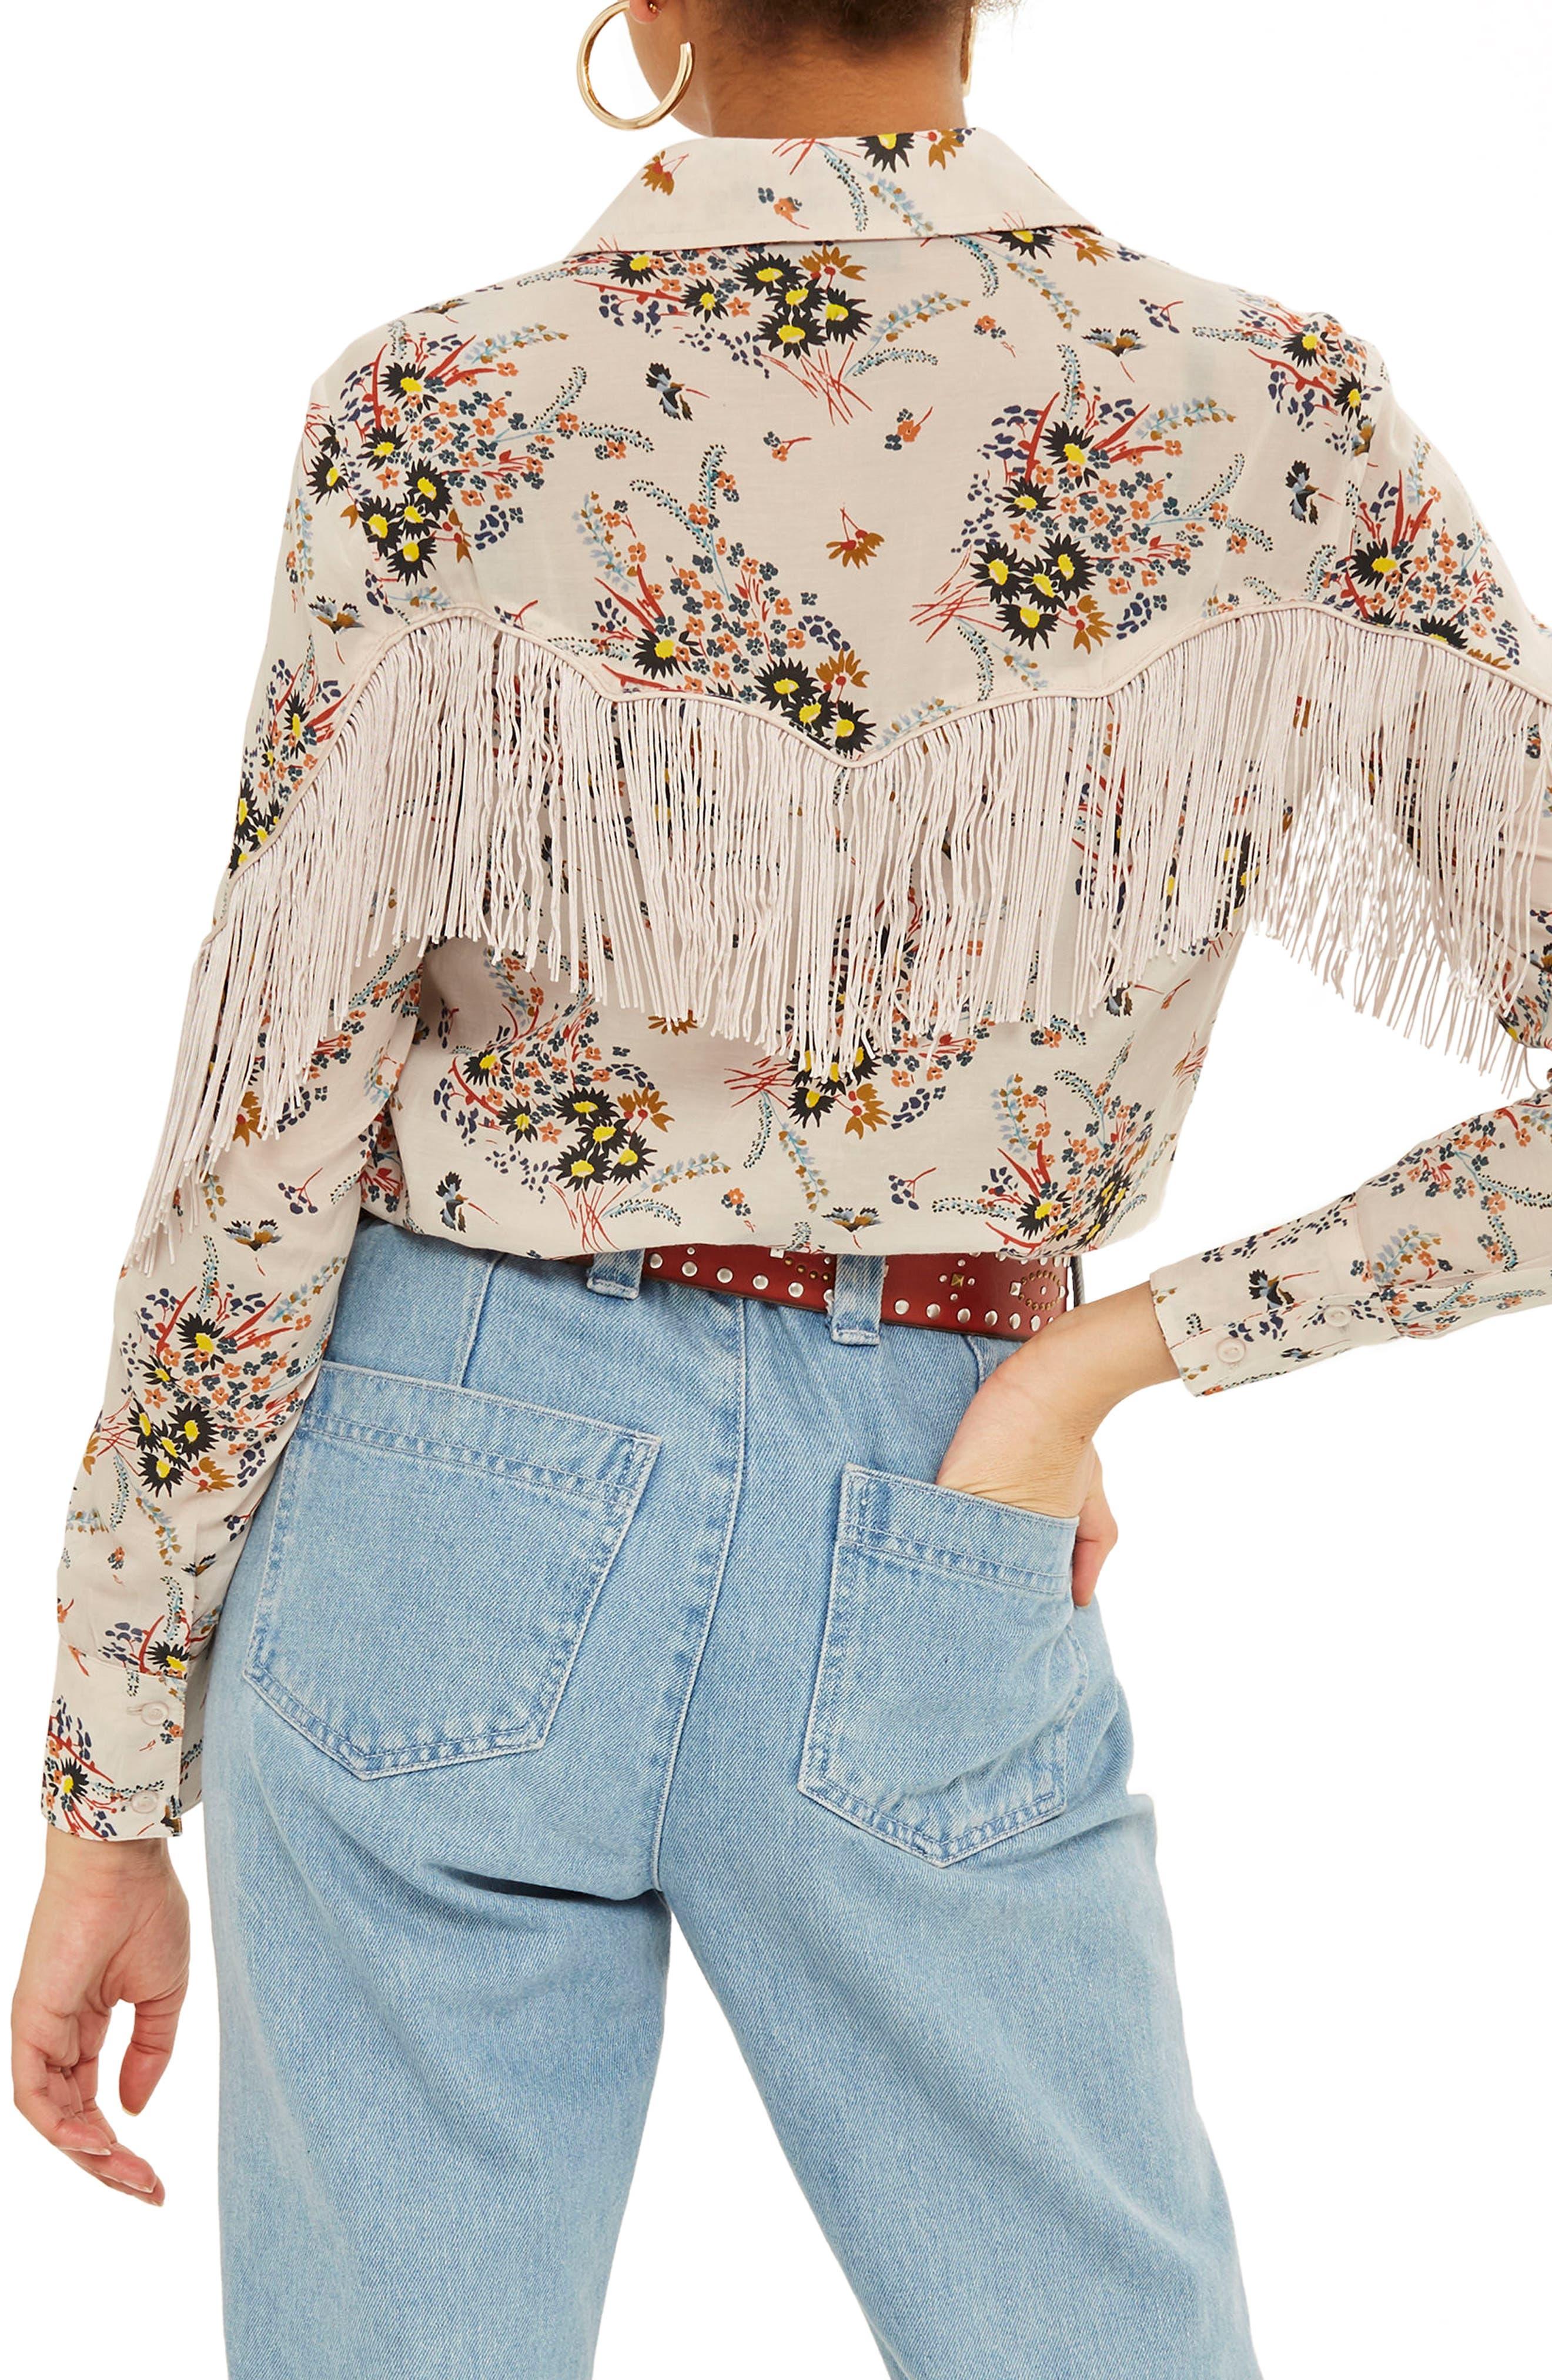 Rodeo Fringe Floral Shirt,                             Alternate thumbnail 2, color,                             901